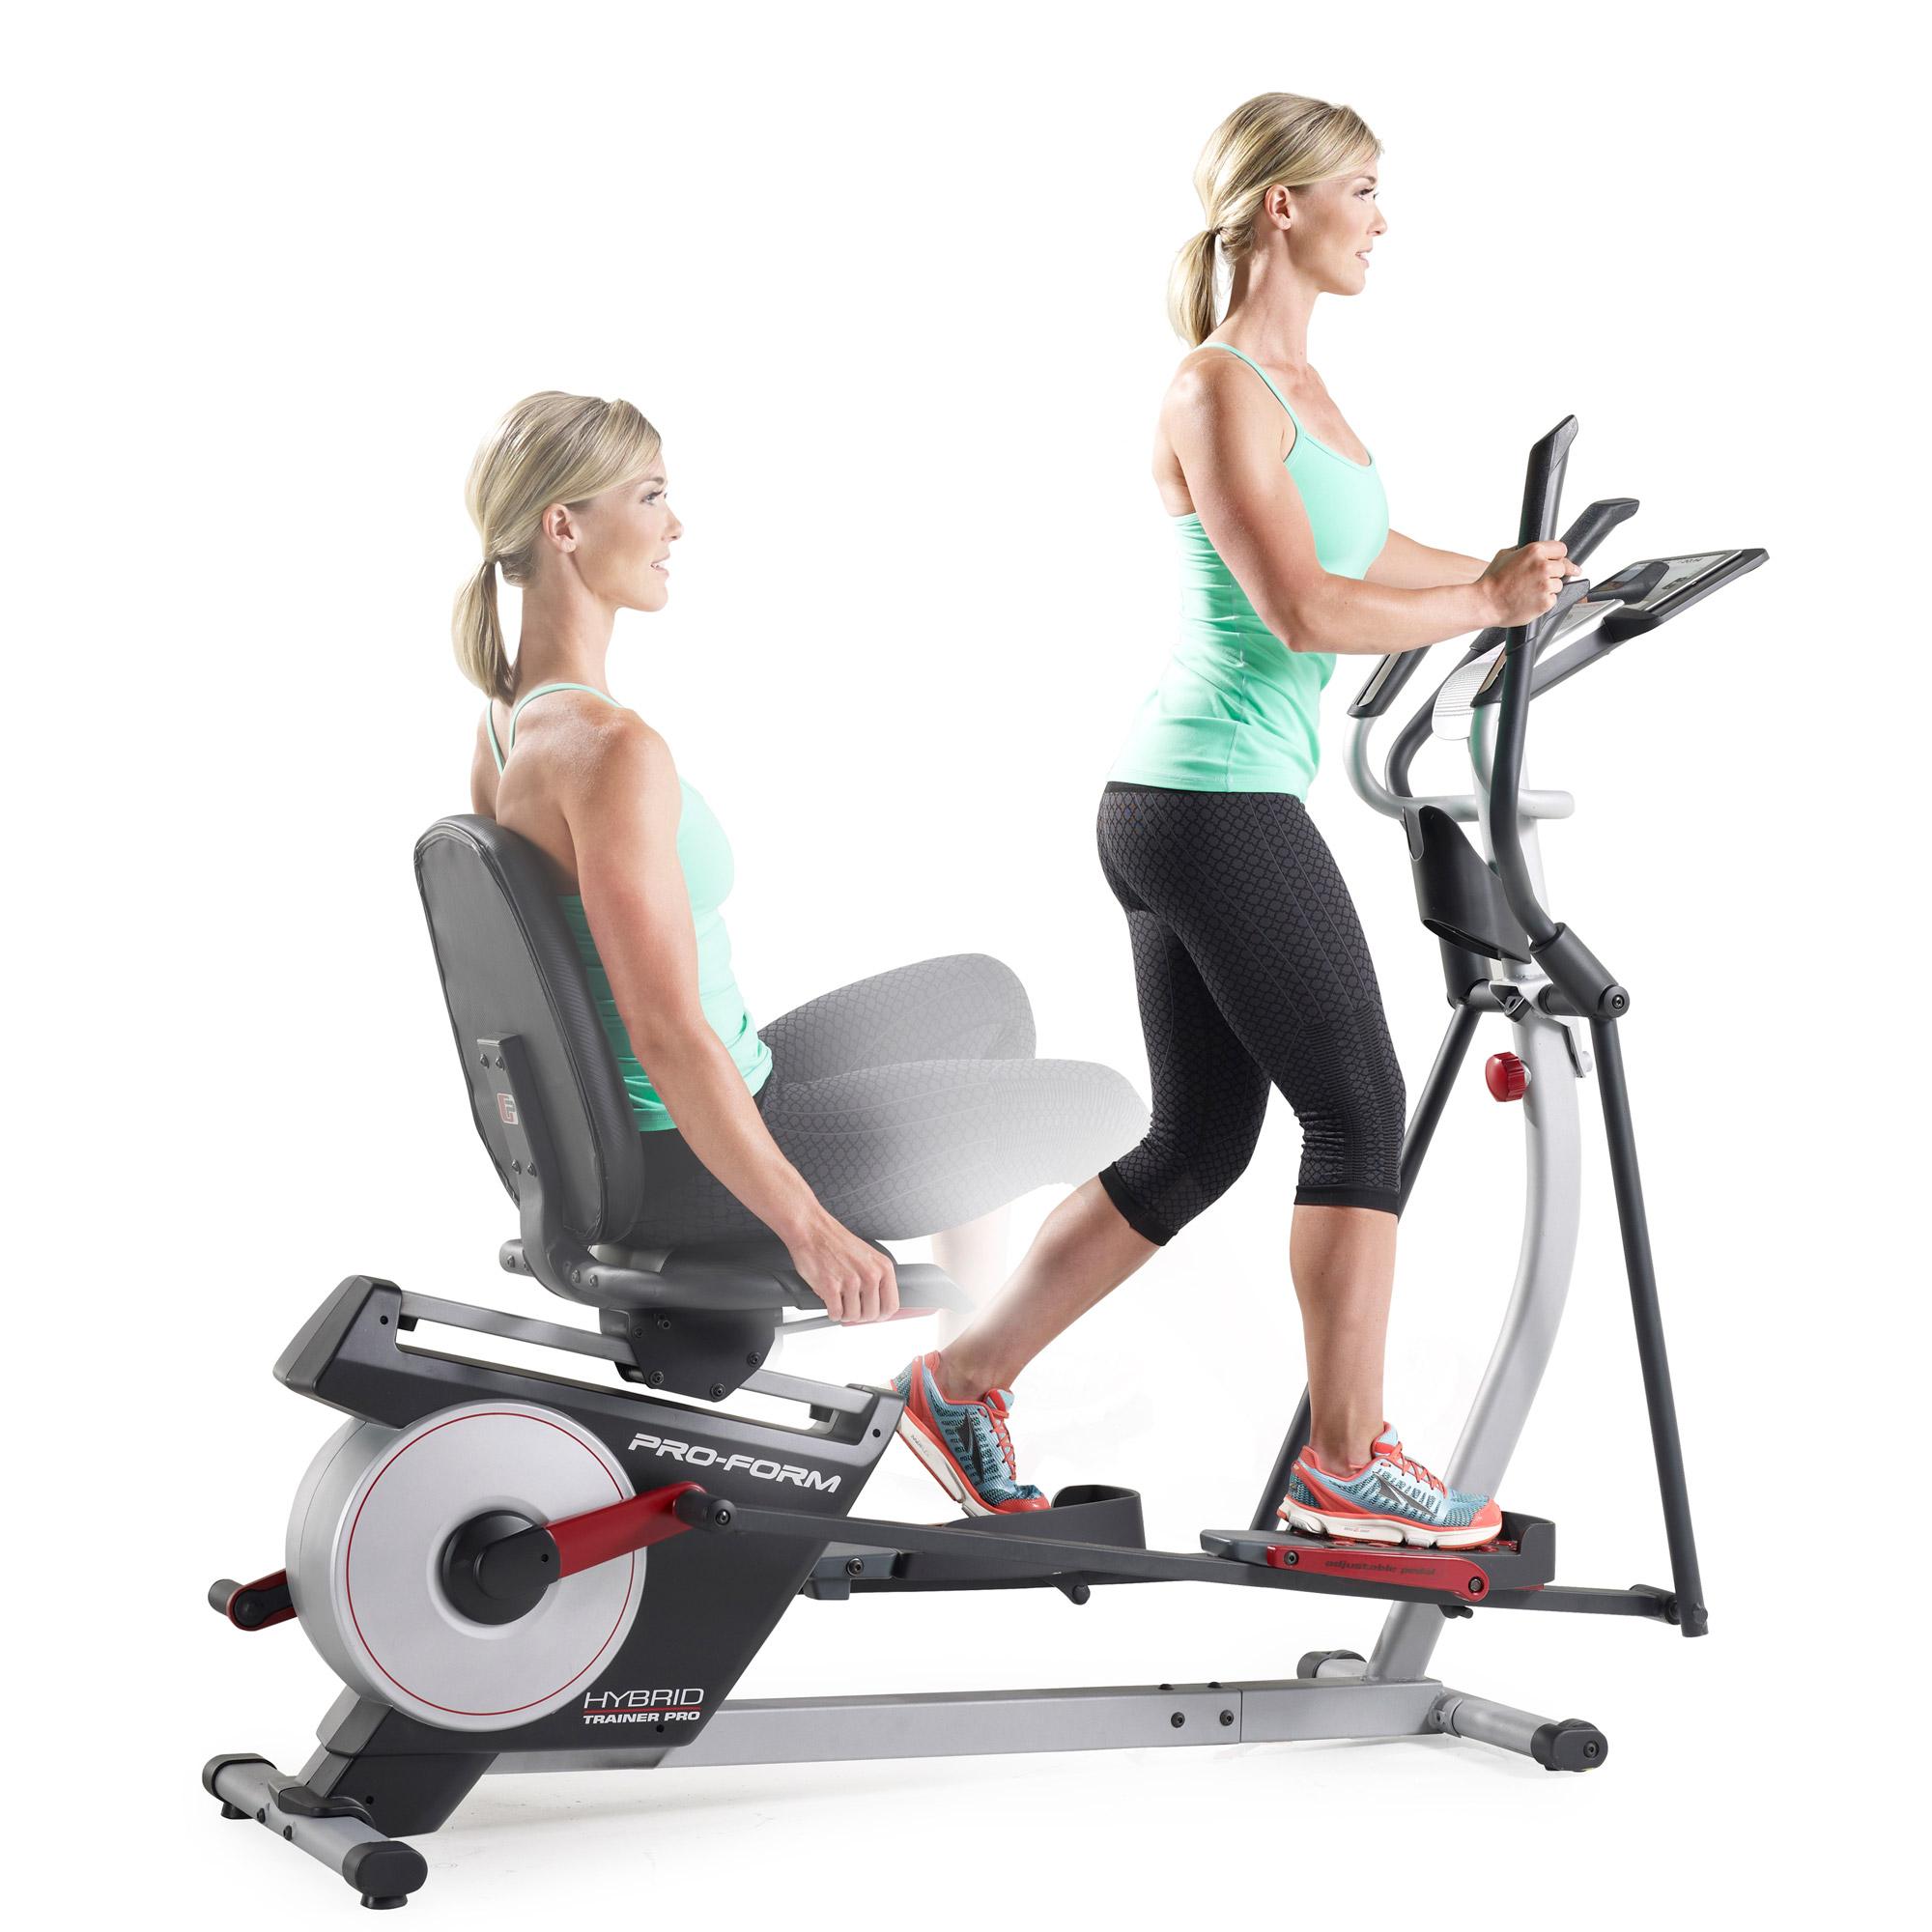 en precision elliptical efx products precor crosstrainer series mats consumer home mat fitness ca